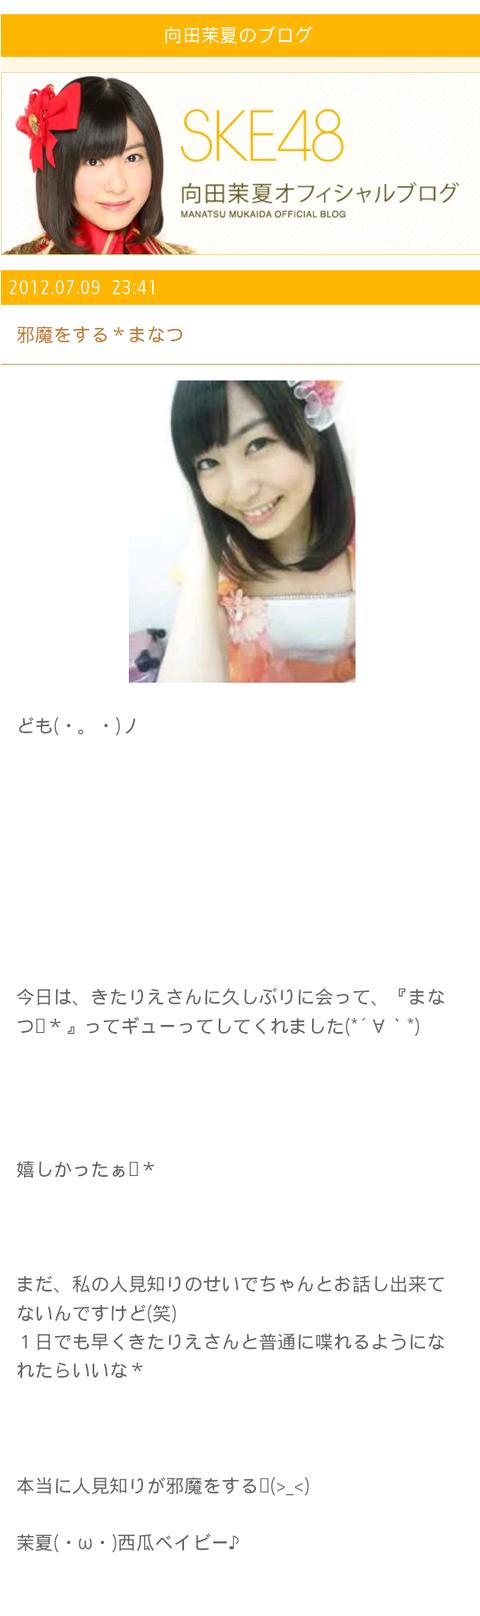 screenshot_2012-07-10_0953